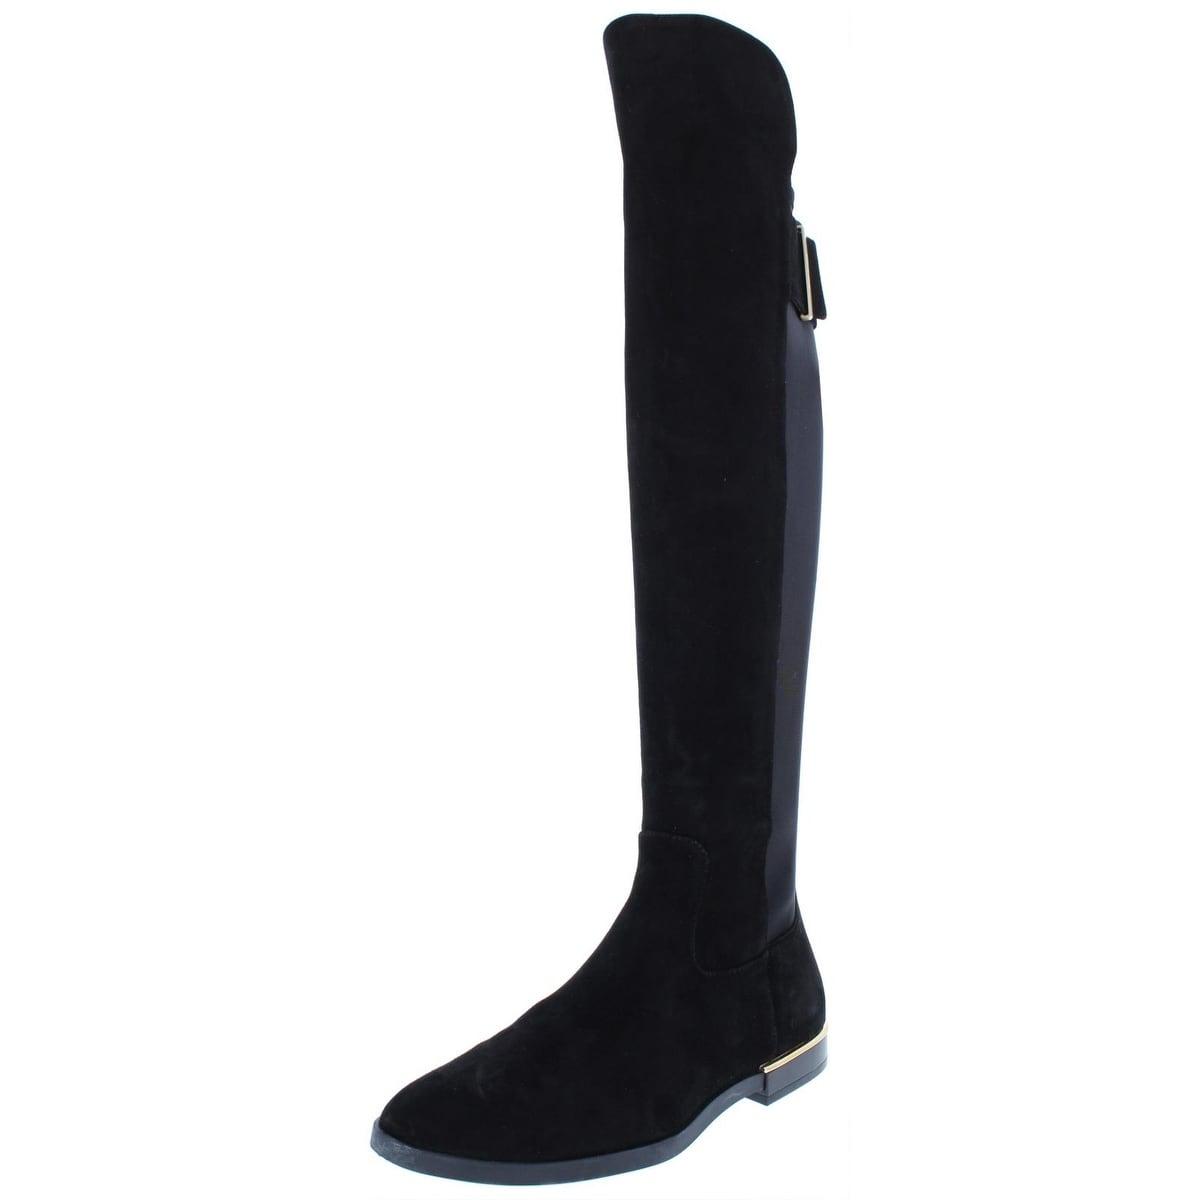 1d3b9b7565f Buy Calvin Klein Women s Boots Online at Overstock